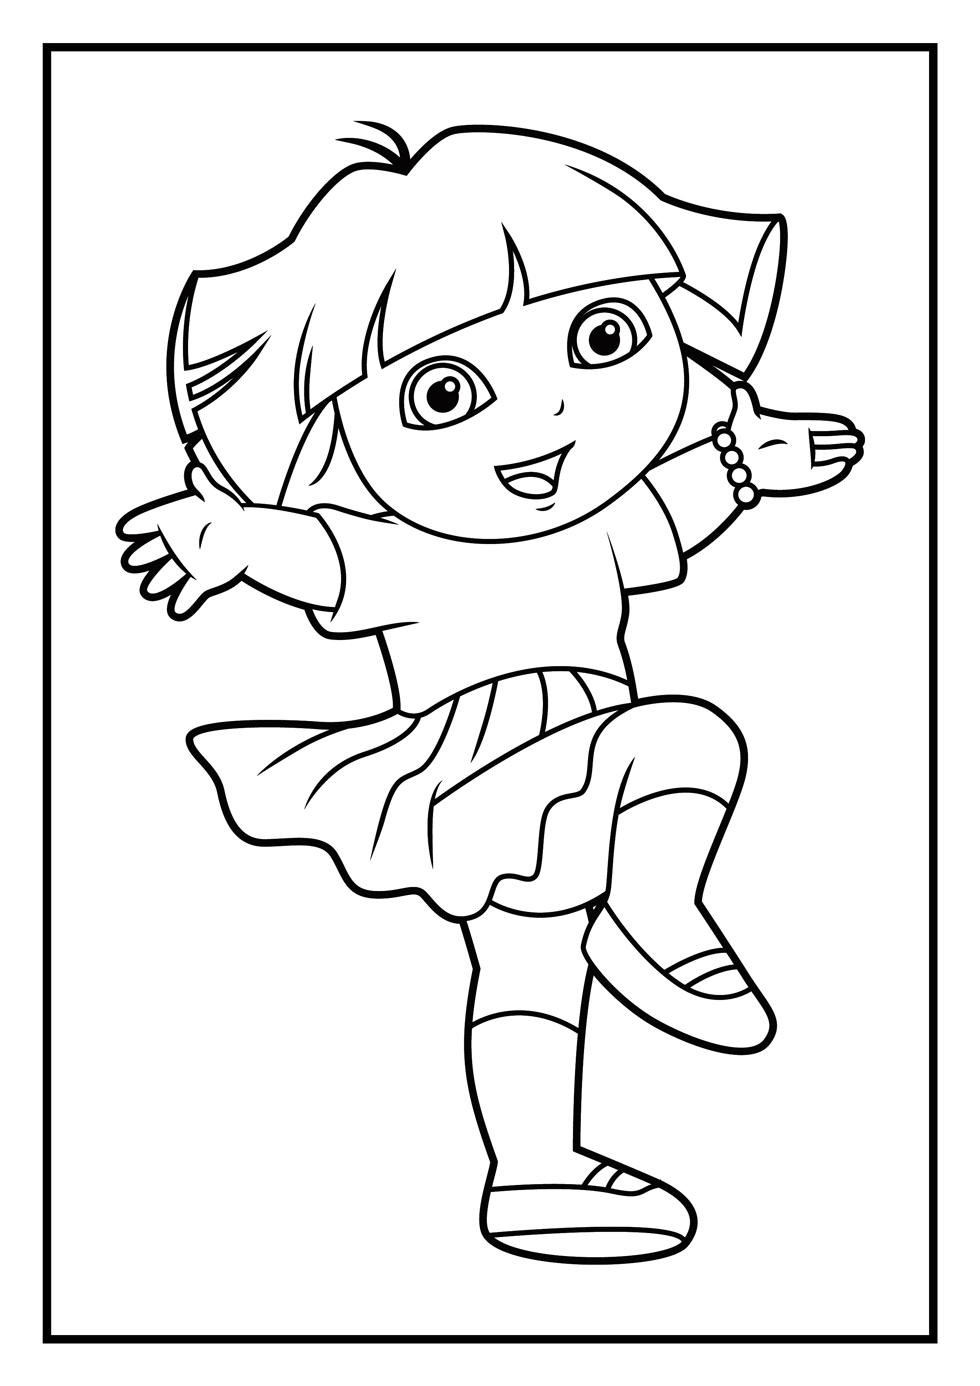 dora coloring sheets kids coloring pages dora the explorer coloring pages sheets coloring dora